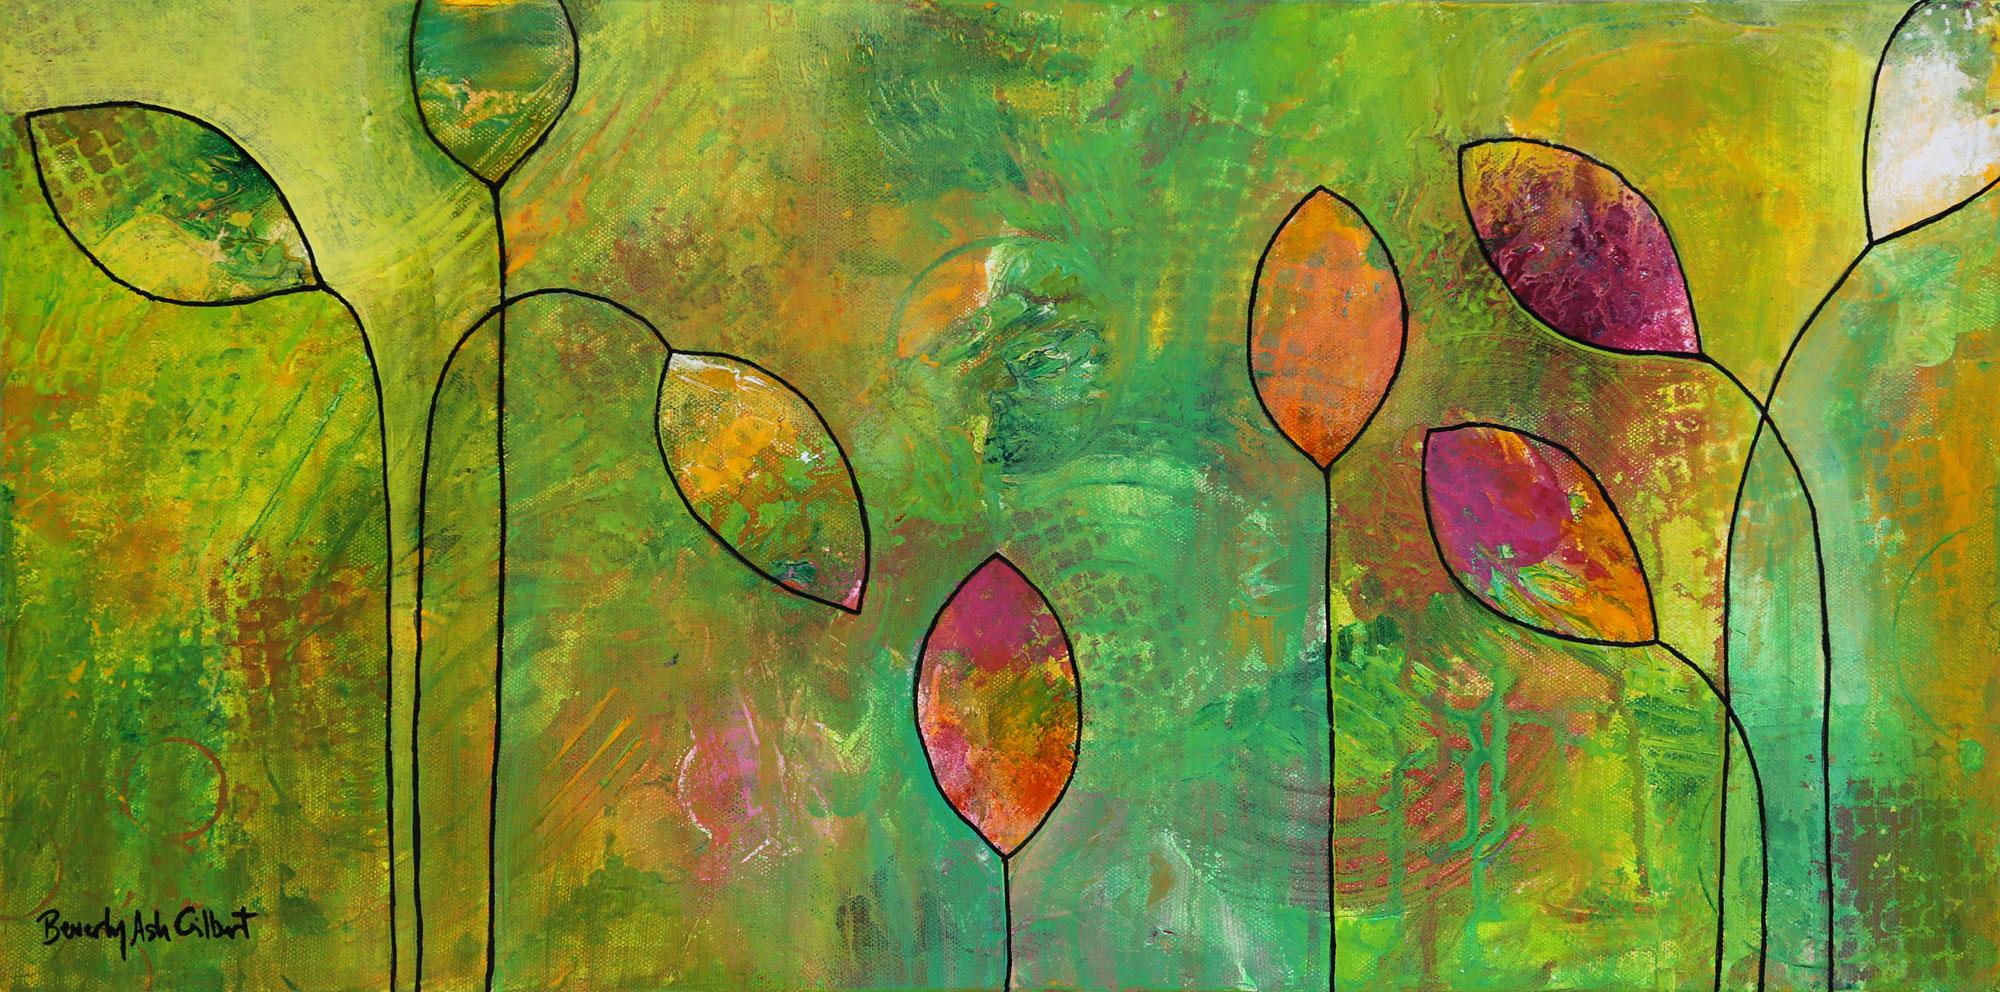 Poppies in a Green Field